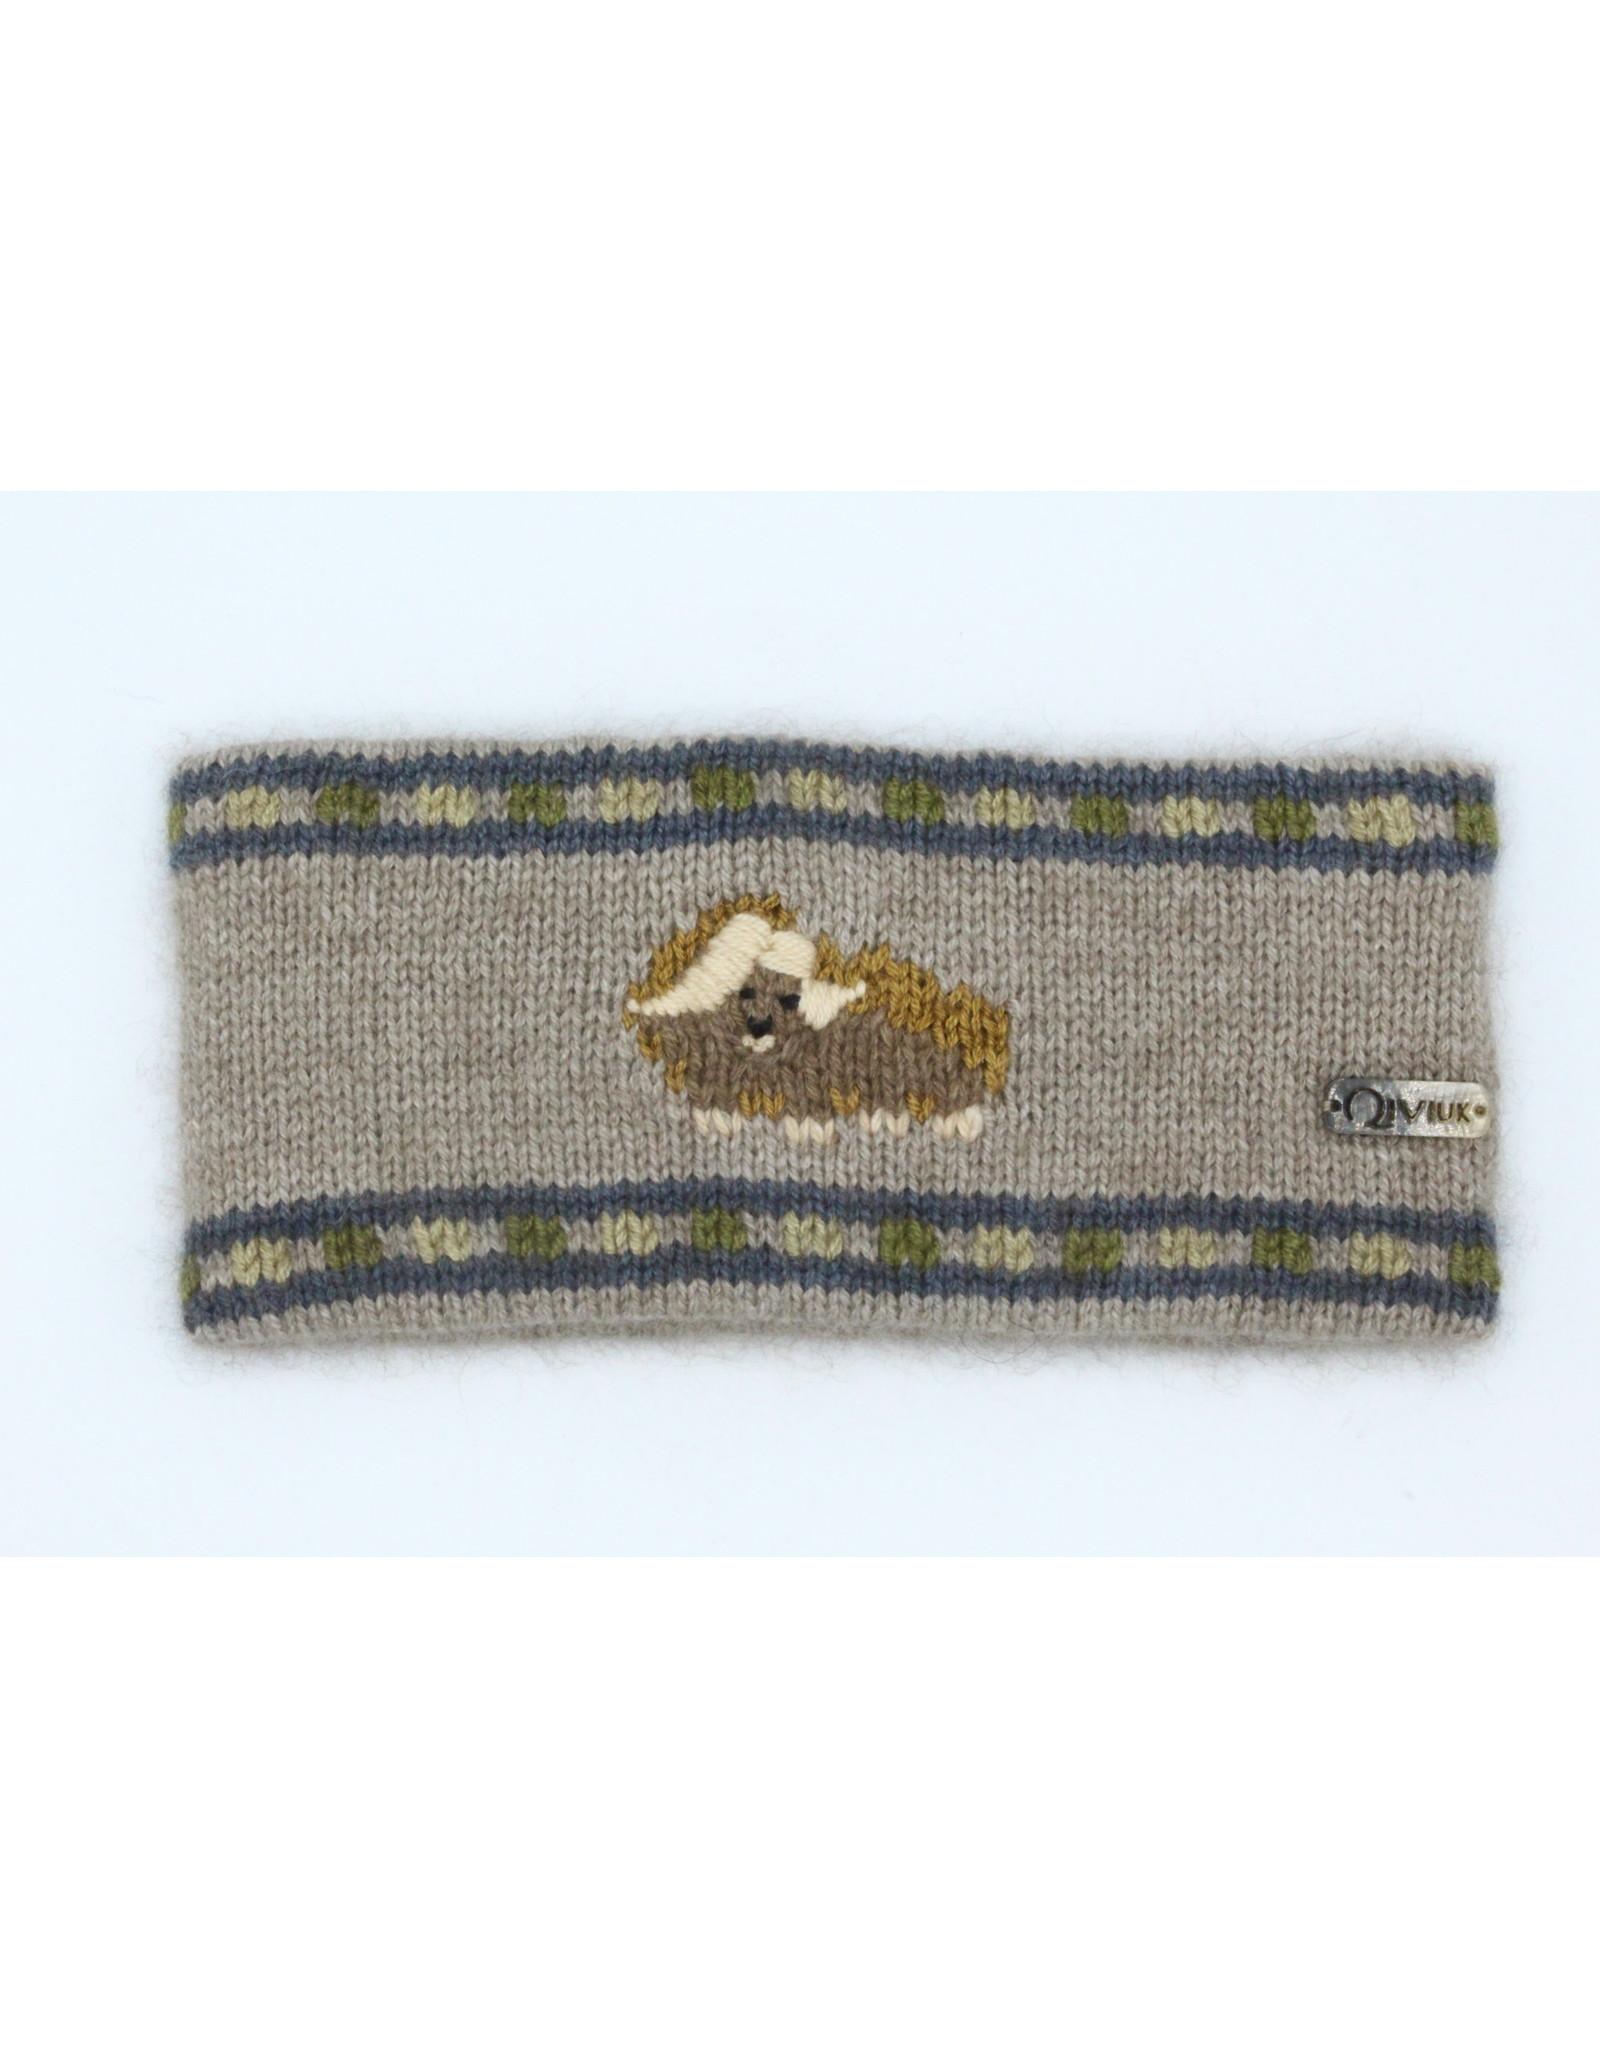 Muskox Headband - 45% Qiviuk 45% Merino 10% Silk